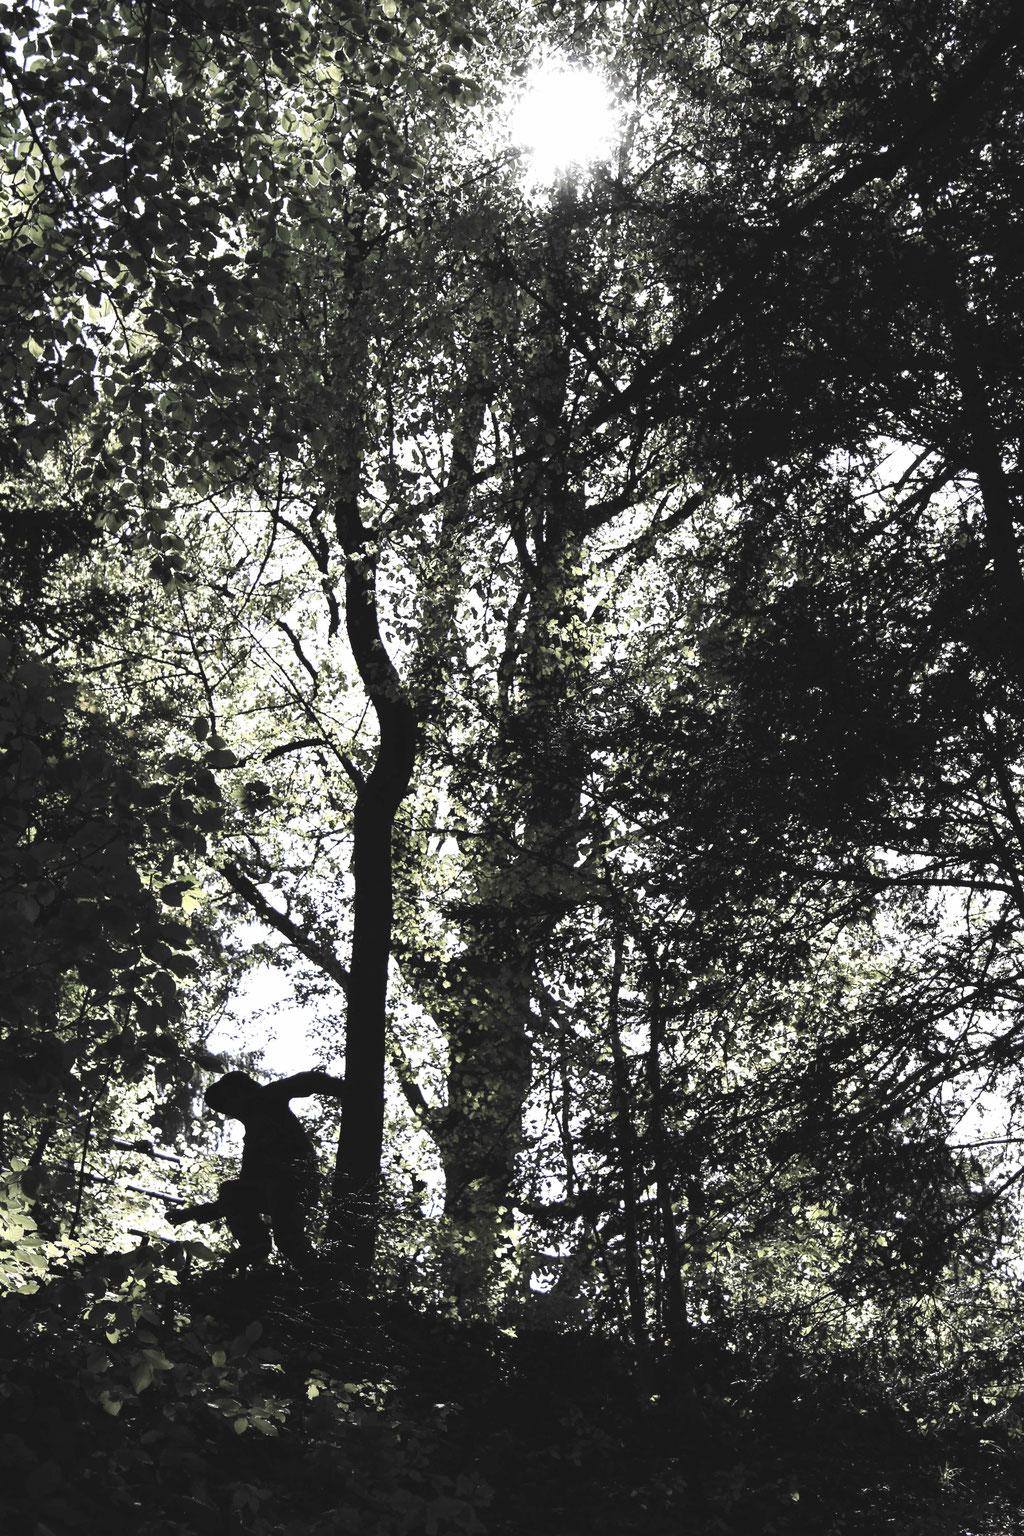 The frontman of Tankus the Henge, Jaz Delorean, disappears into the wilderness in St Gallen, Switzerland. May 2016